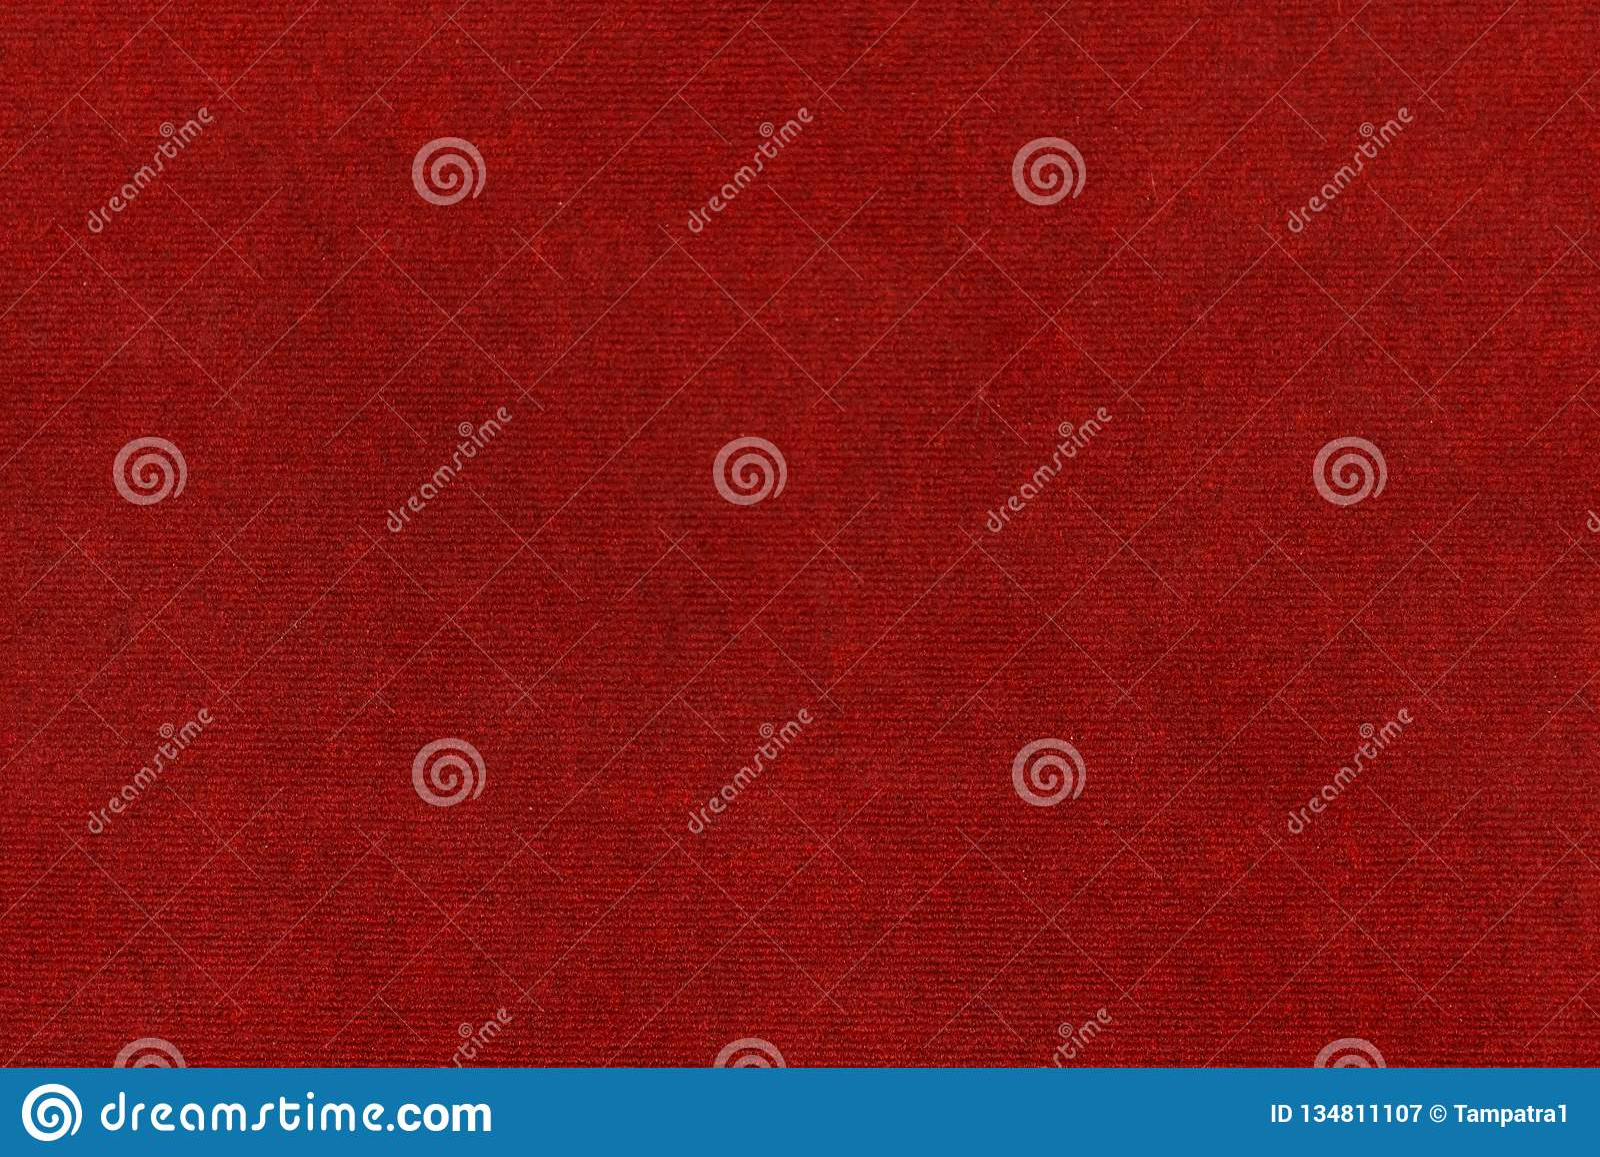 Red Carpet Fabric Flooring Pattern Surface Texture. Close ...  Red Carpet Texture Pattern